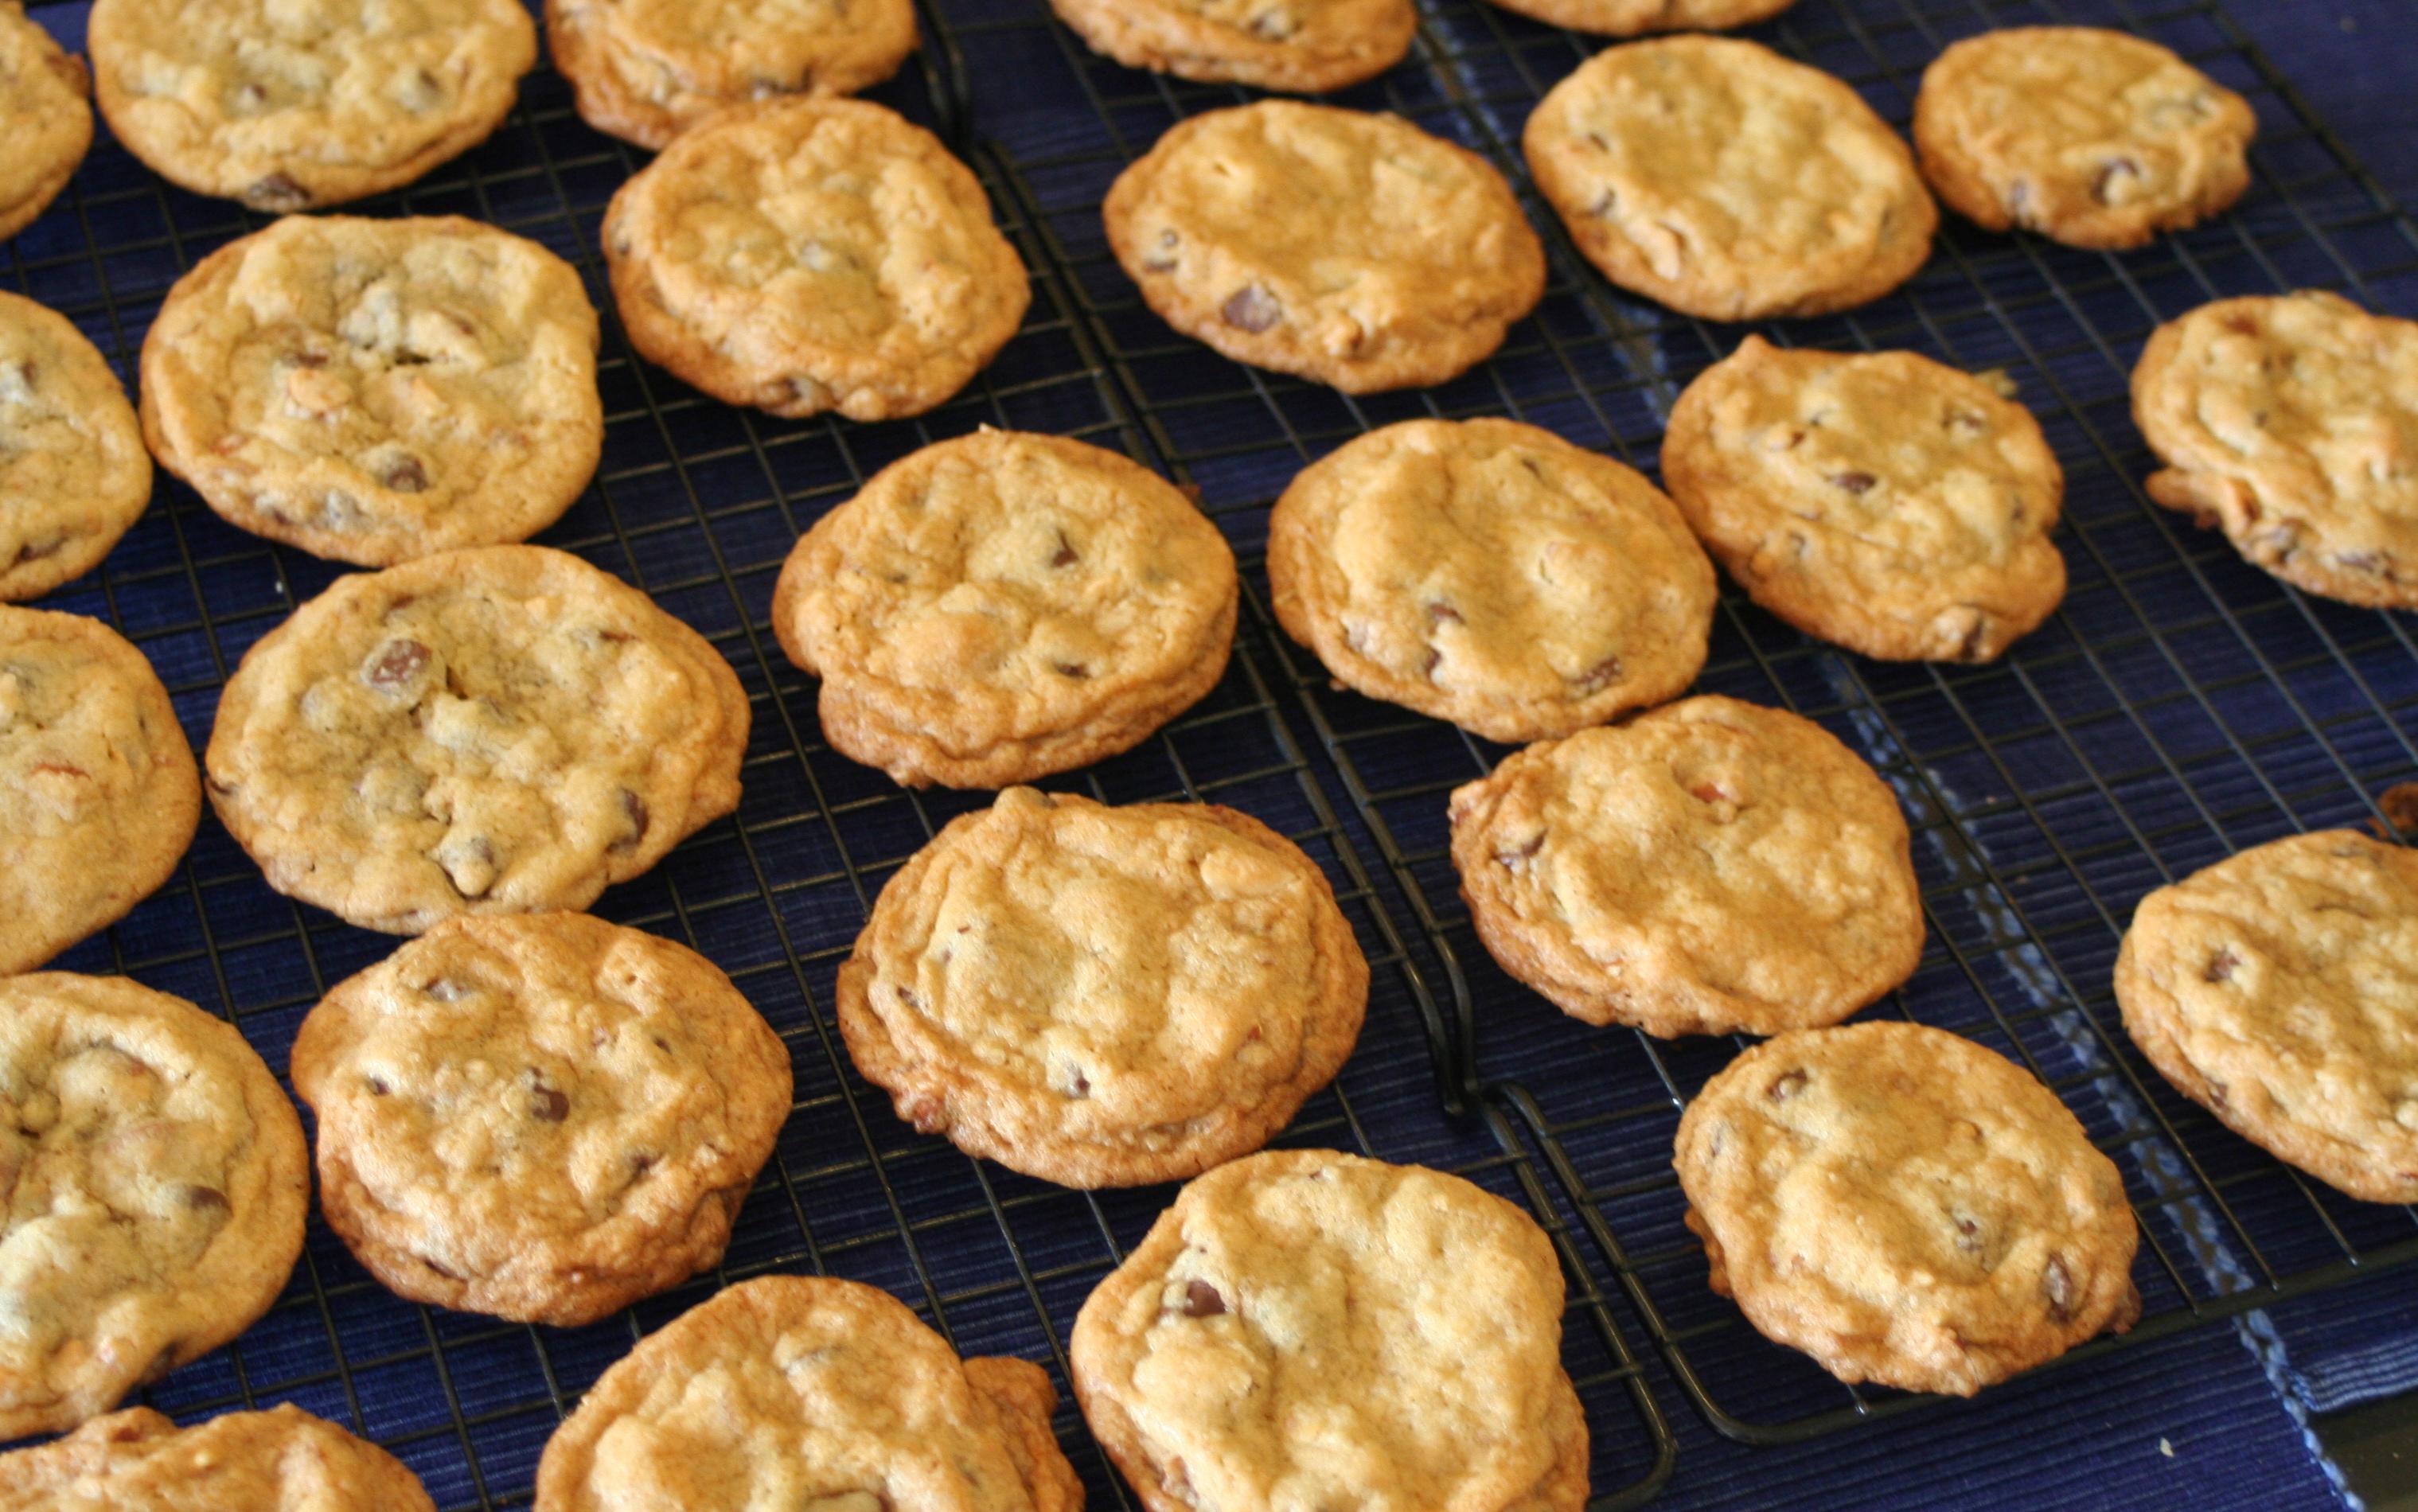 Description Almond chocolate chip cookies on wire rack, June 2009.jpg